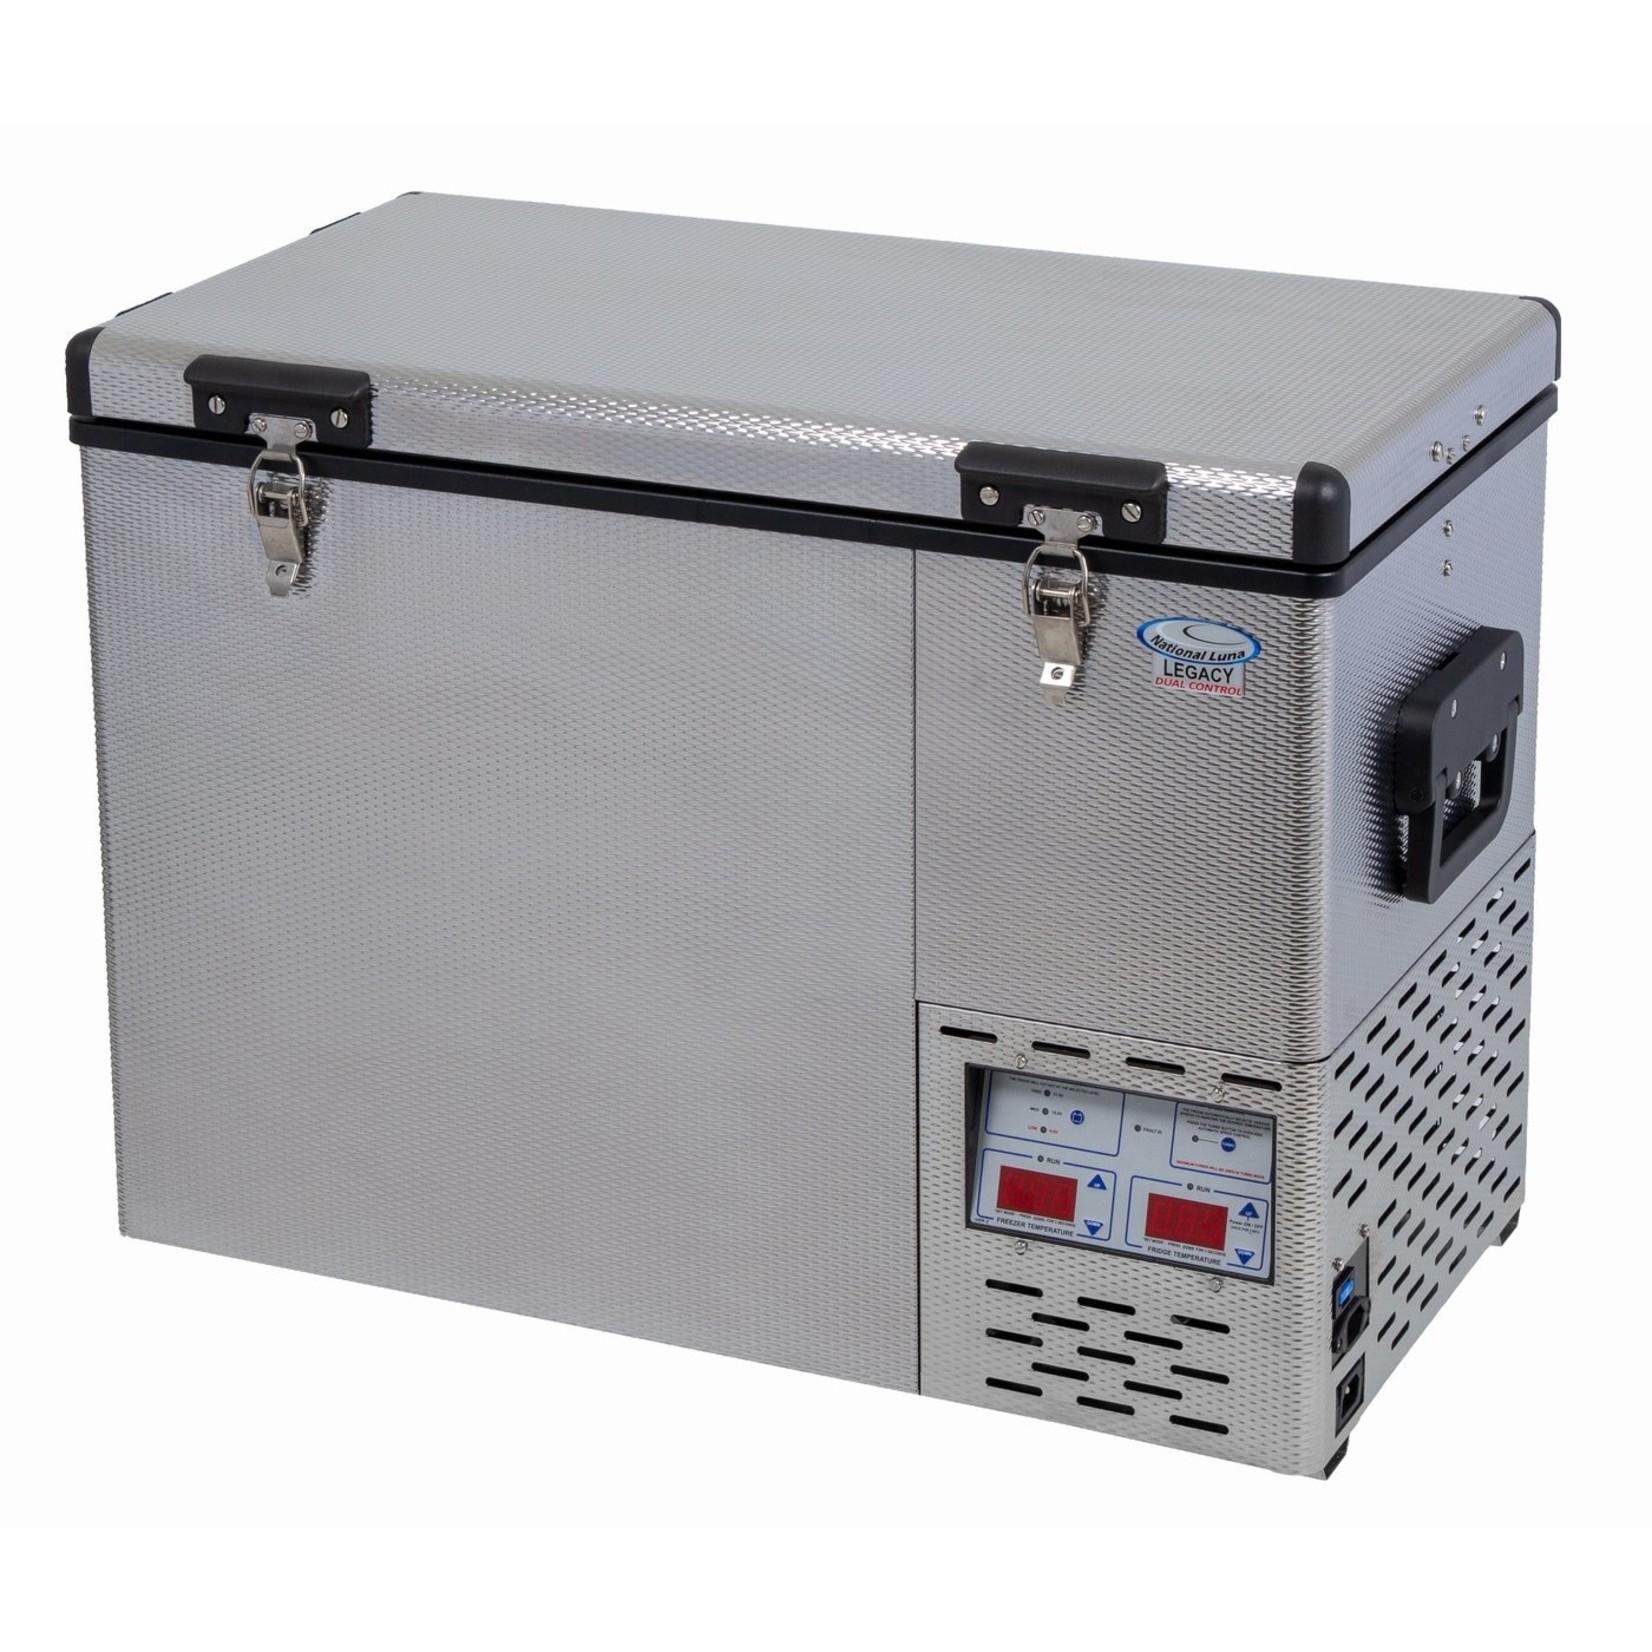 National Luna National Luna Legacy Dual Control Fridge/Freezer